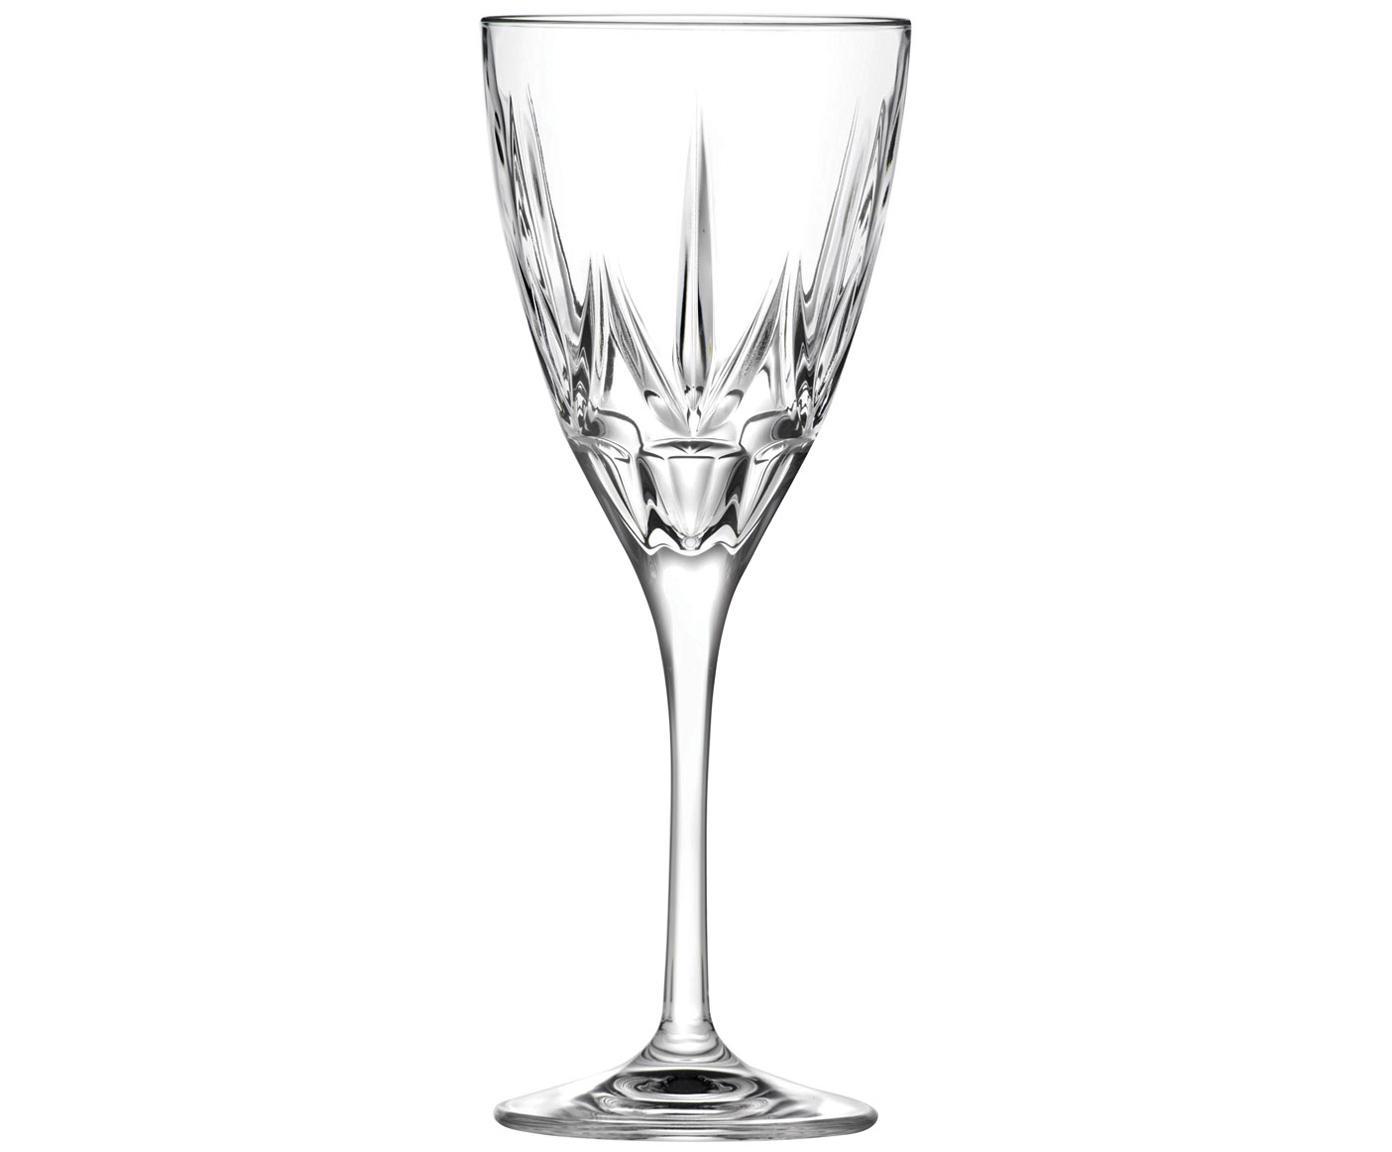 Kristallen witte wijnglazen Chic, 6 stuks, Kristalglas, Transparant, Ø 8 x H 21 cm